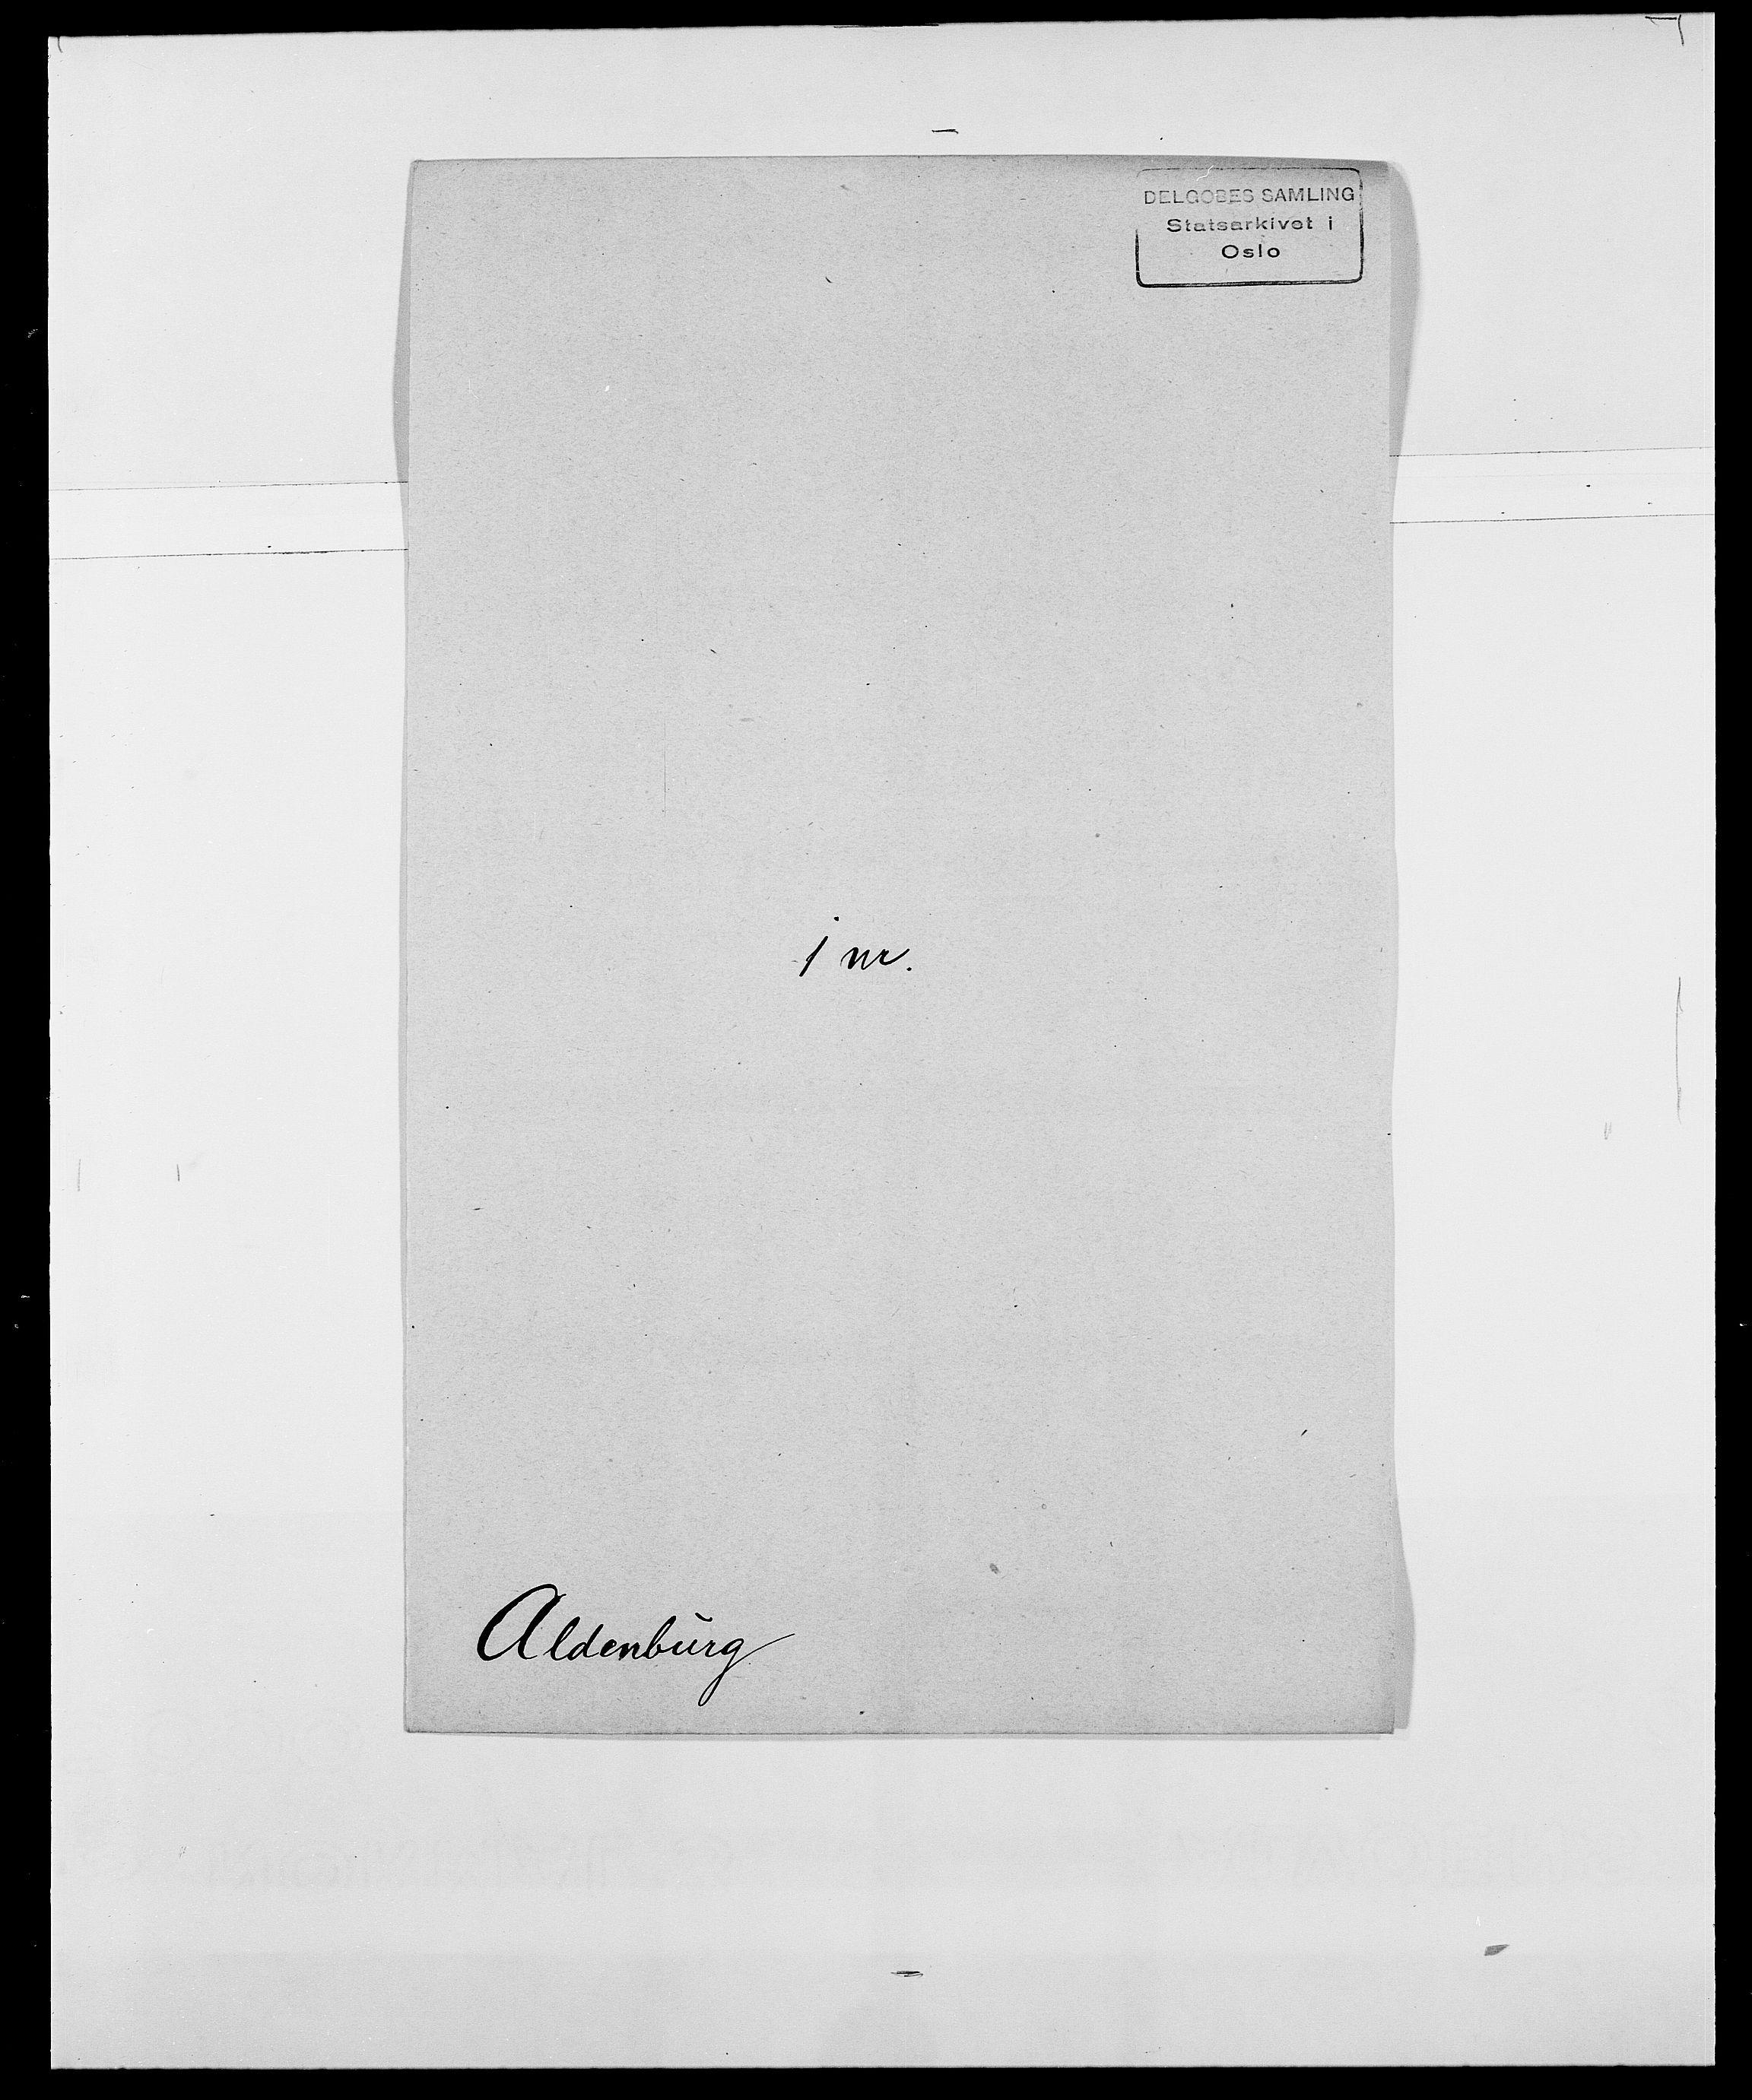 SAO, Delgobe, Charles Antoine - samling, D/Da/L0001: Aabye - Angerman, s. 384